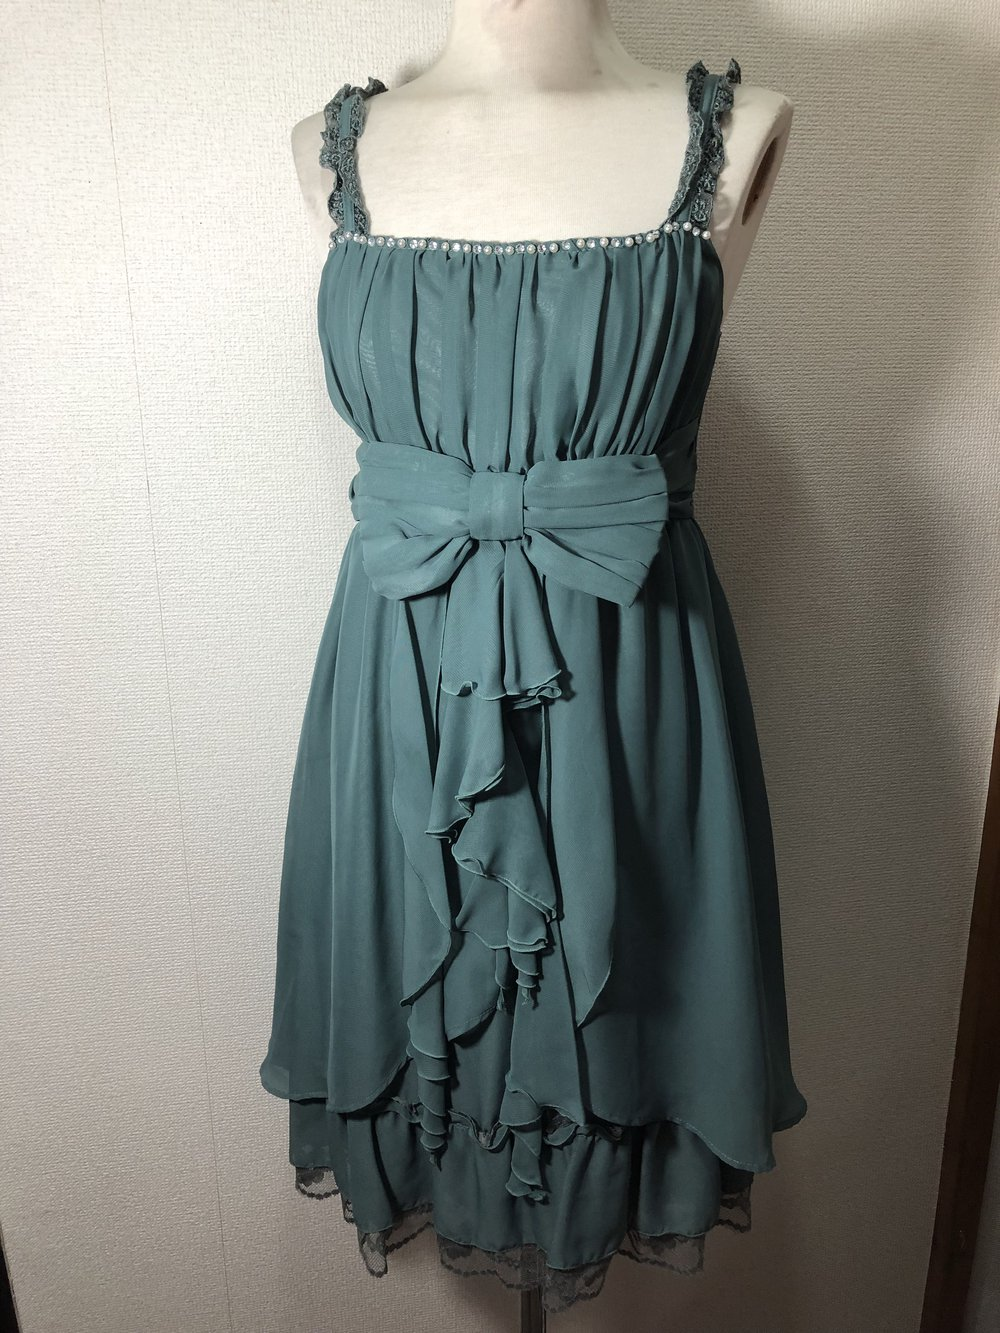 87a9a5ff288814 ... Axes Femme feenhaftes Chiffon Rüschen Kleid m. Schleife & spitze,  Japan, retro,